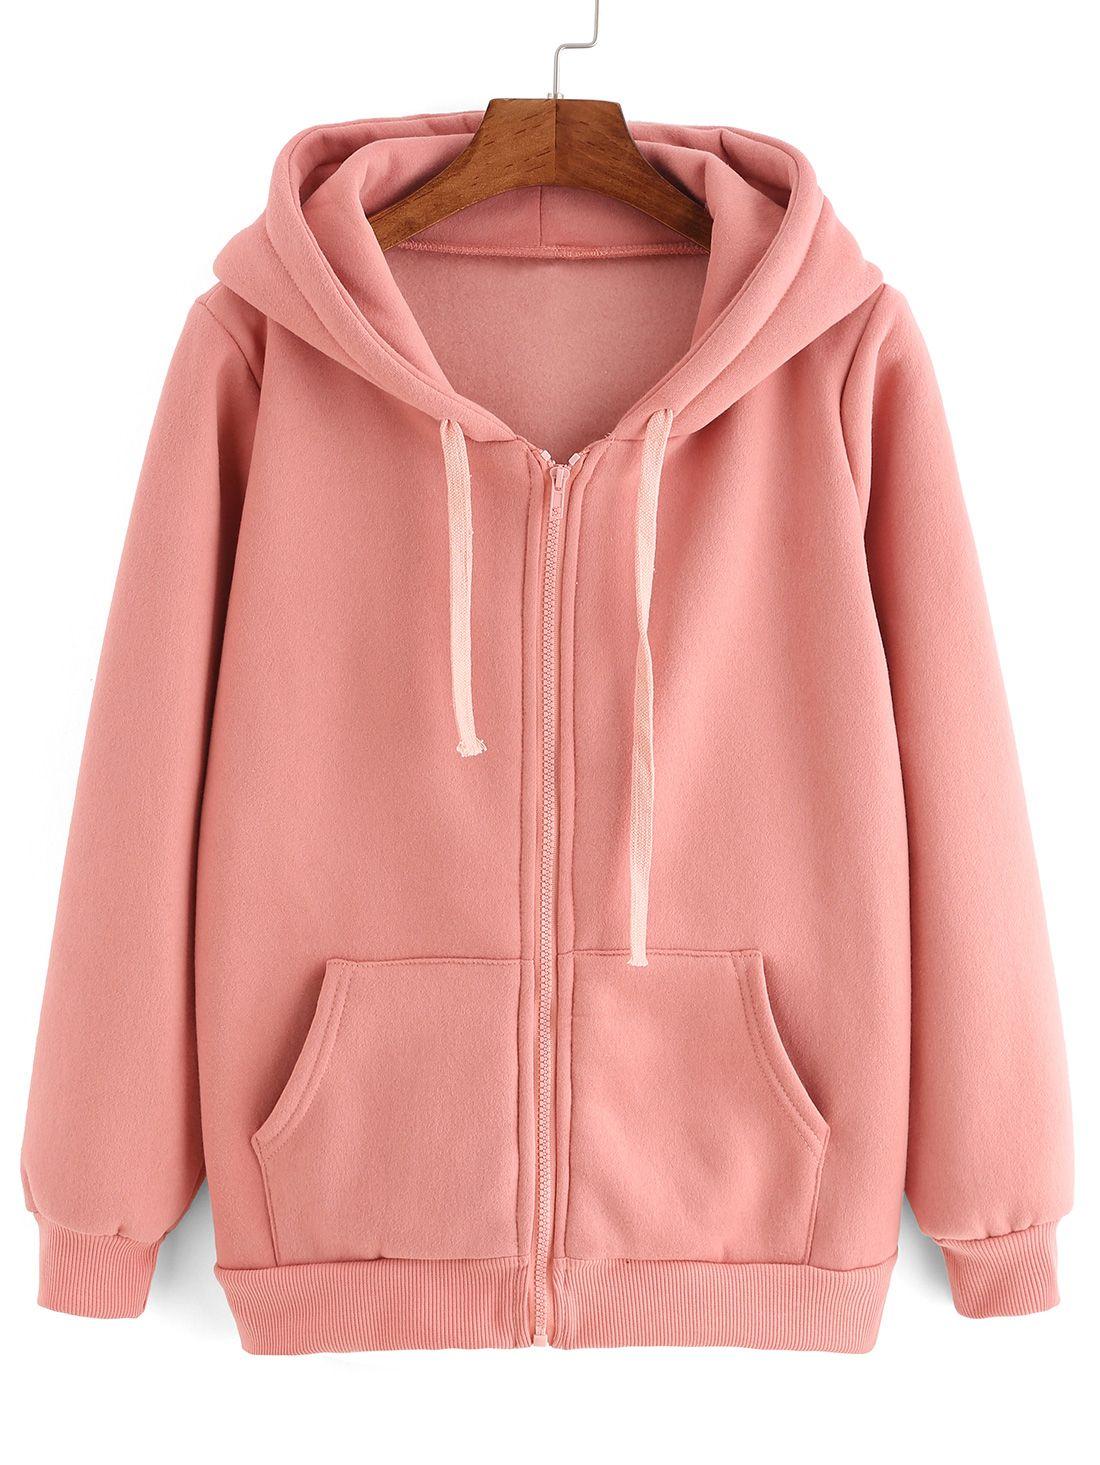 Pink hooded long sleeve pockets sweatshirt fashion style